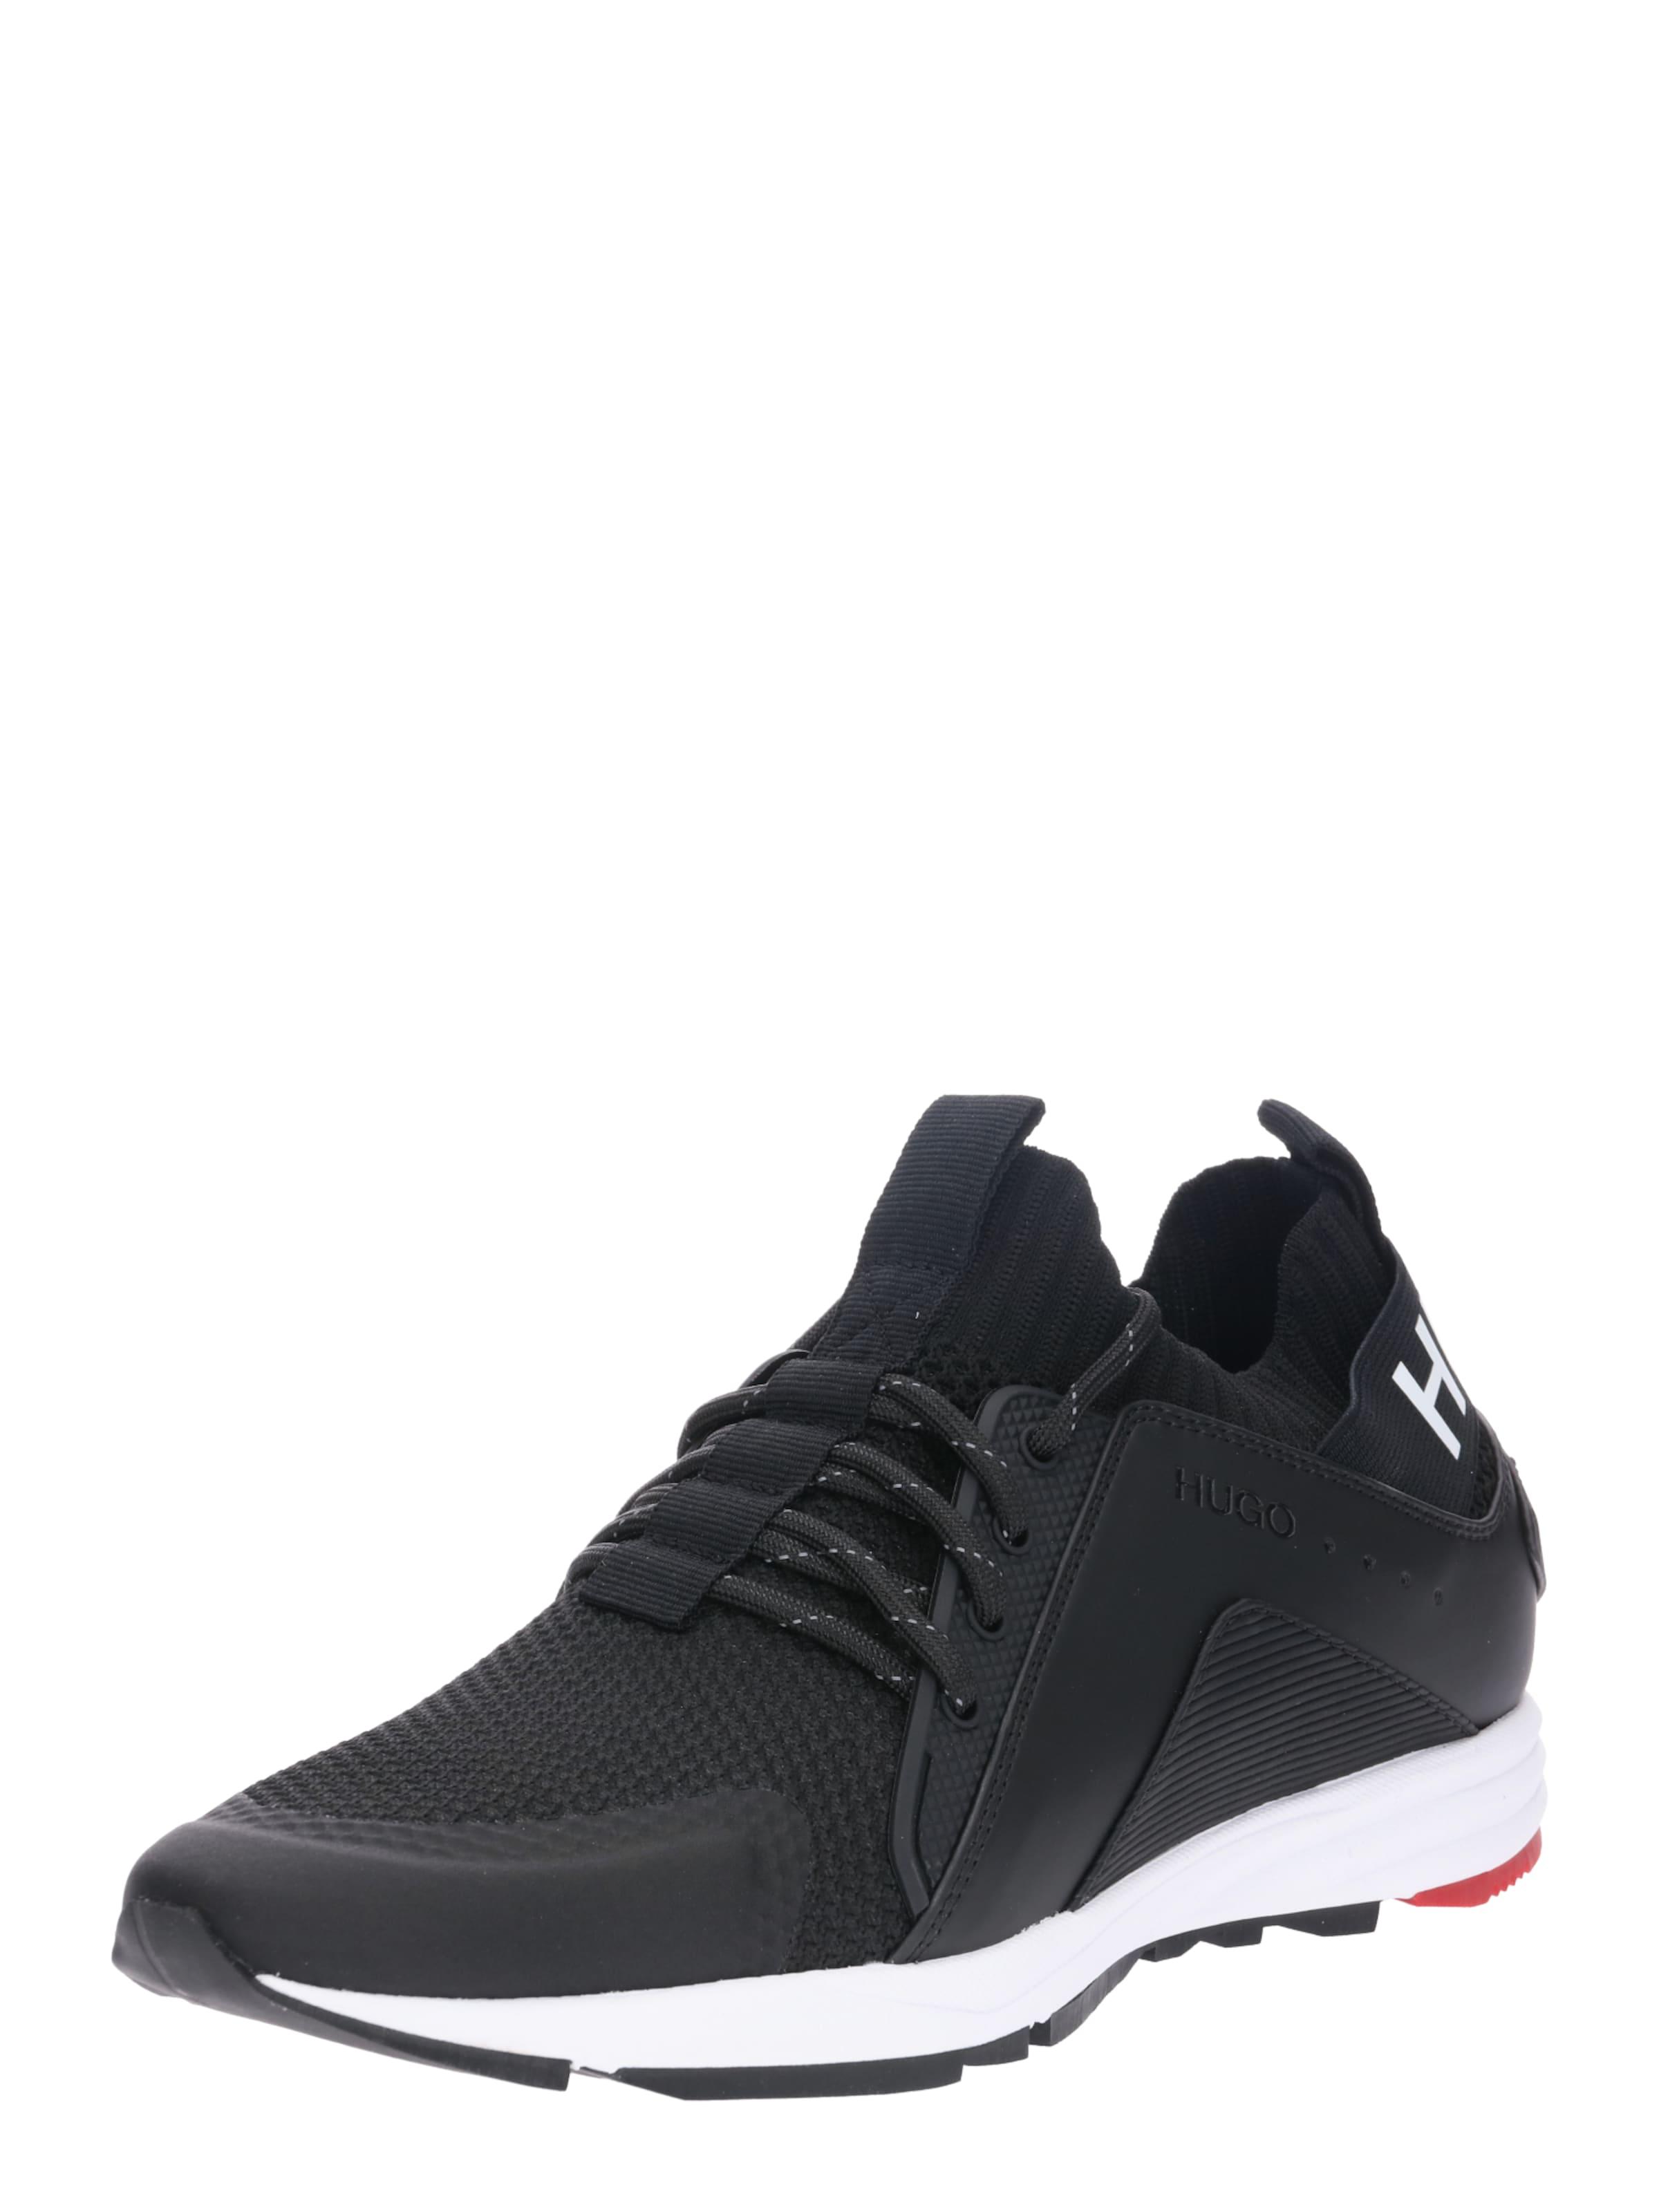 In 'hybrid Schwarz runn Sneaker Hugo knmx' WY9IbeDEH2